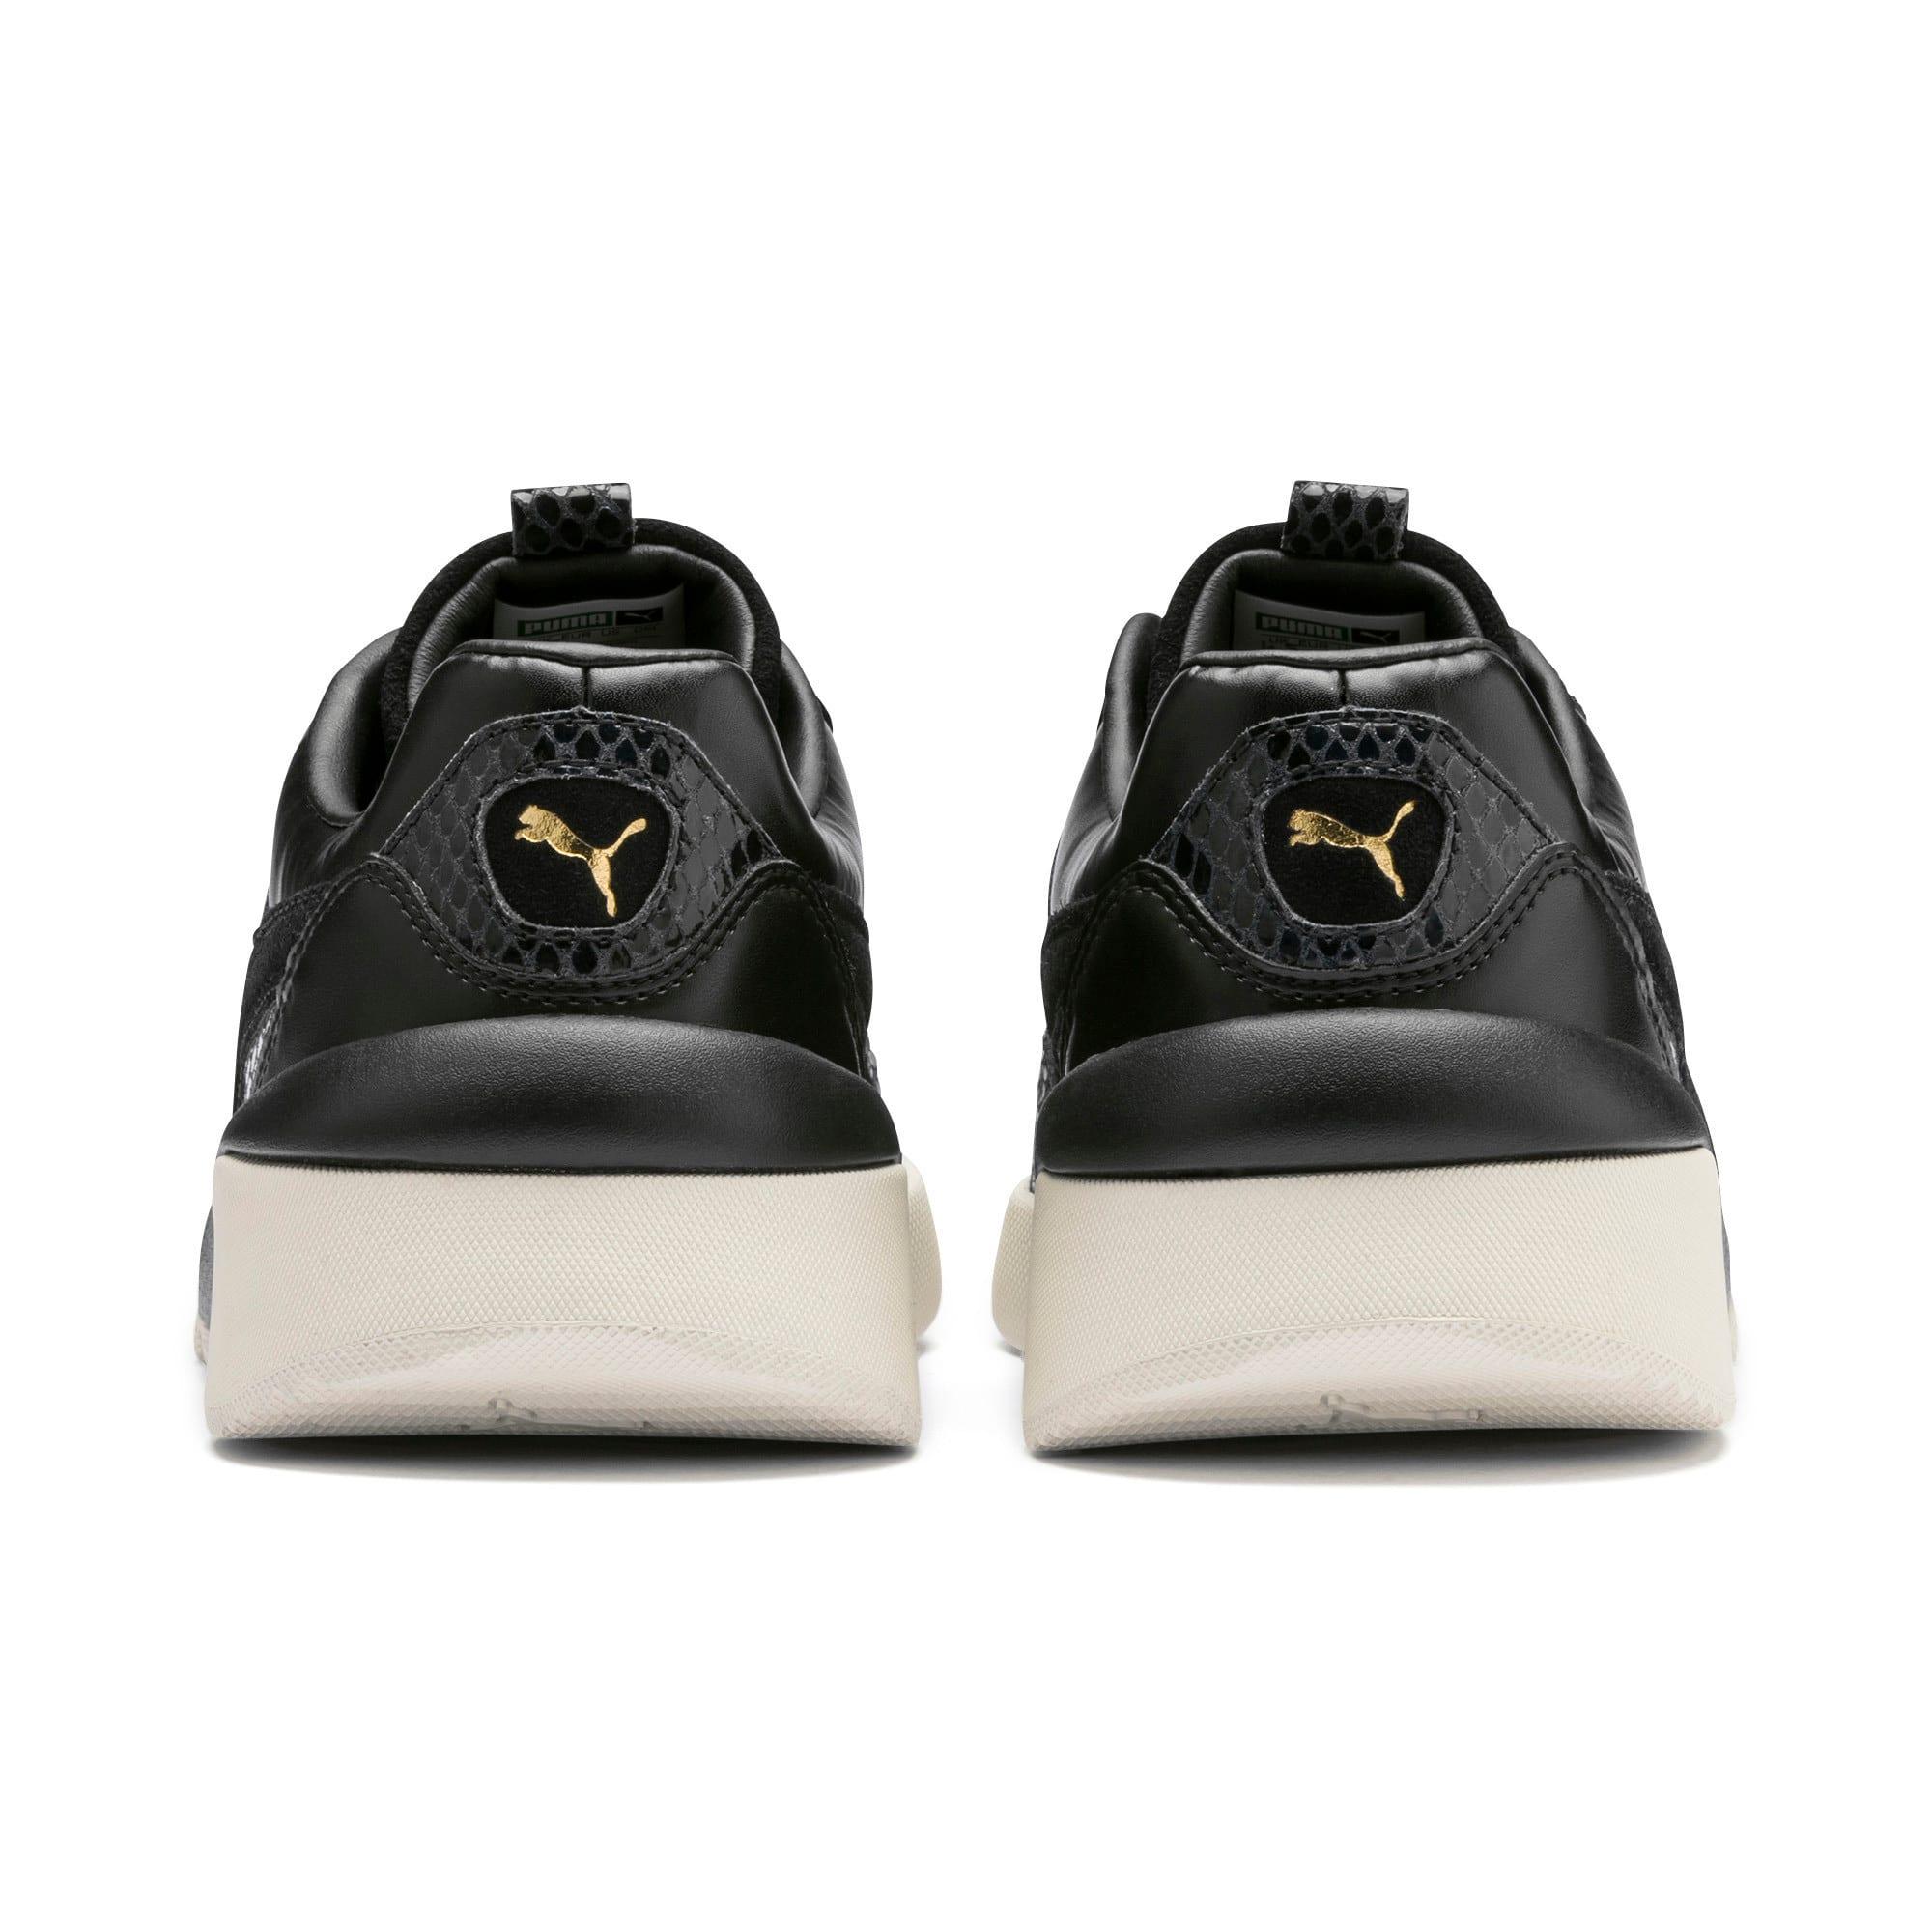 Thumbnail 4 of Aeon Play Women's Sneakers, Puma Black, medium